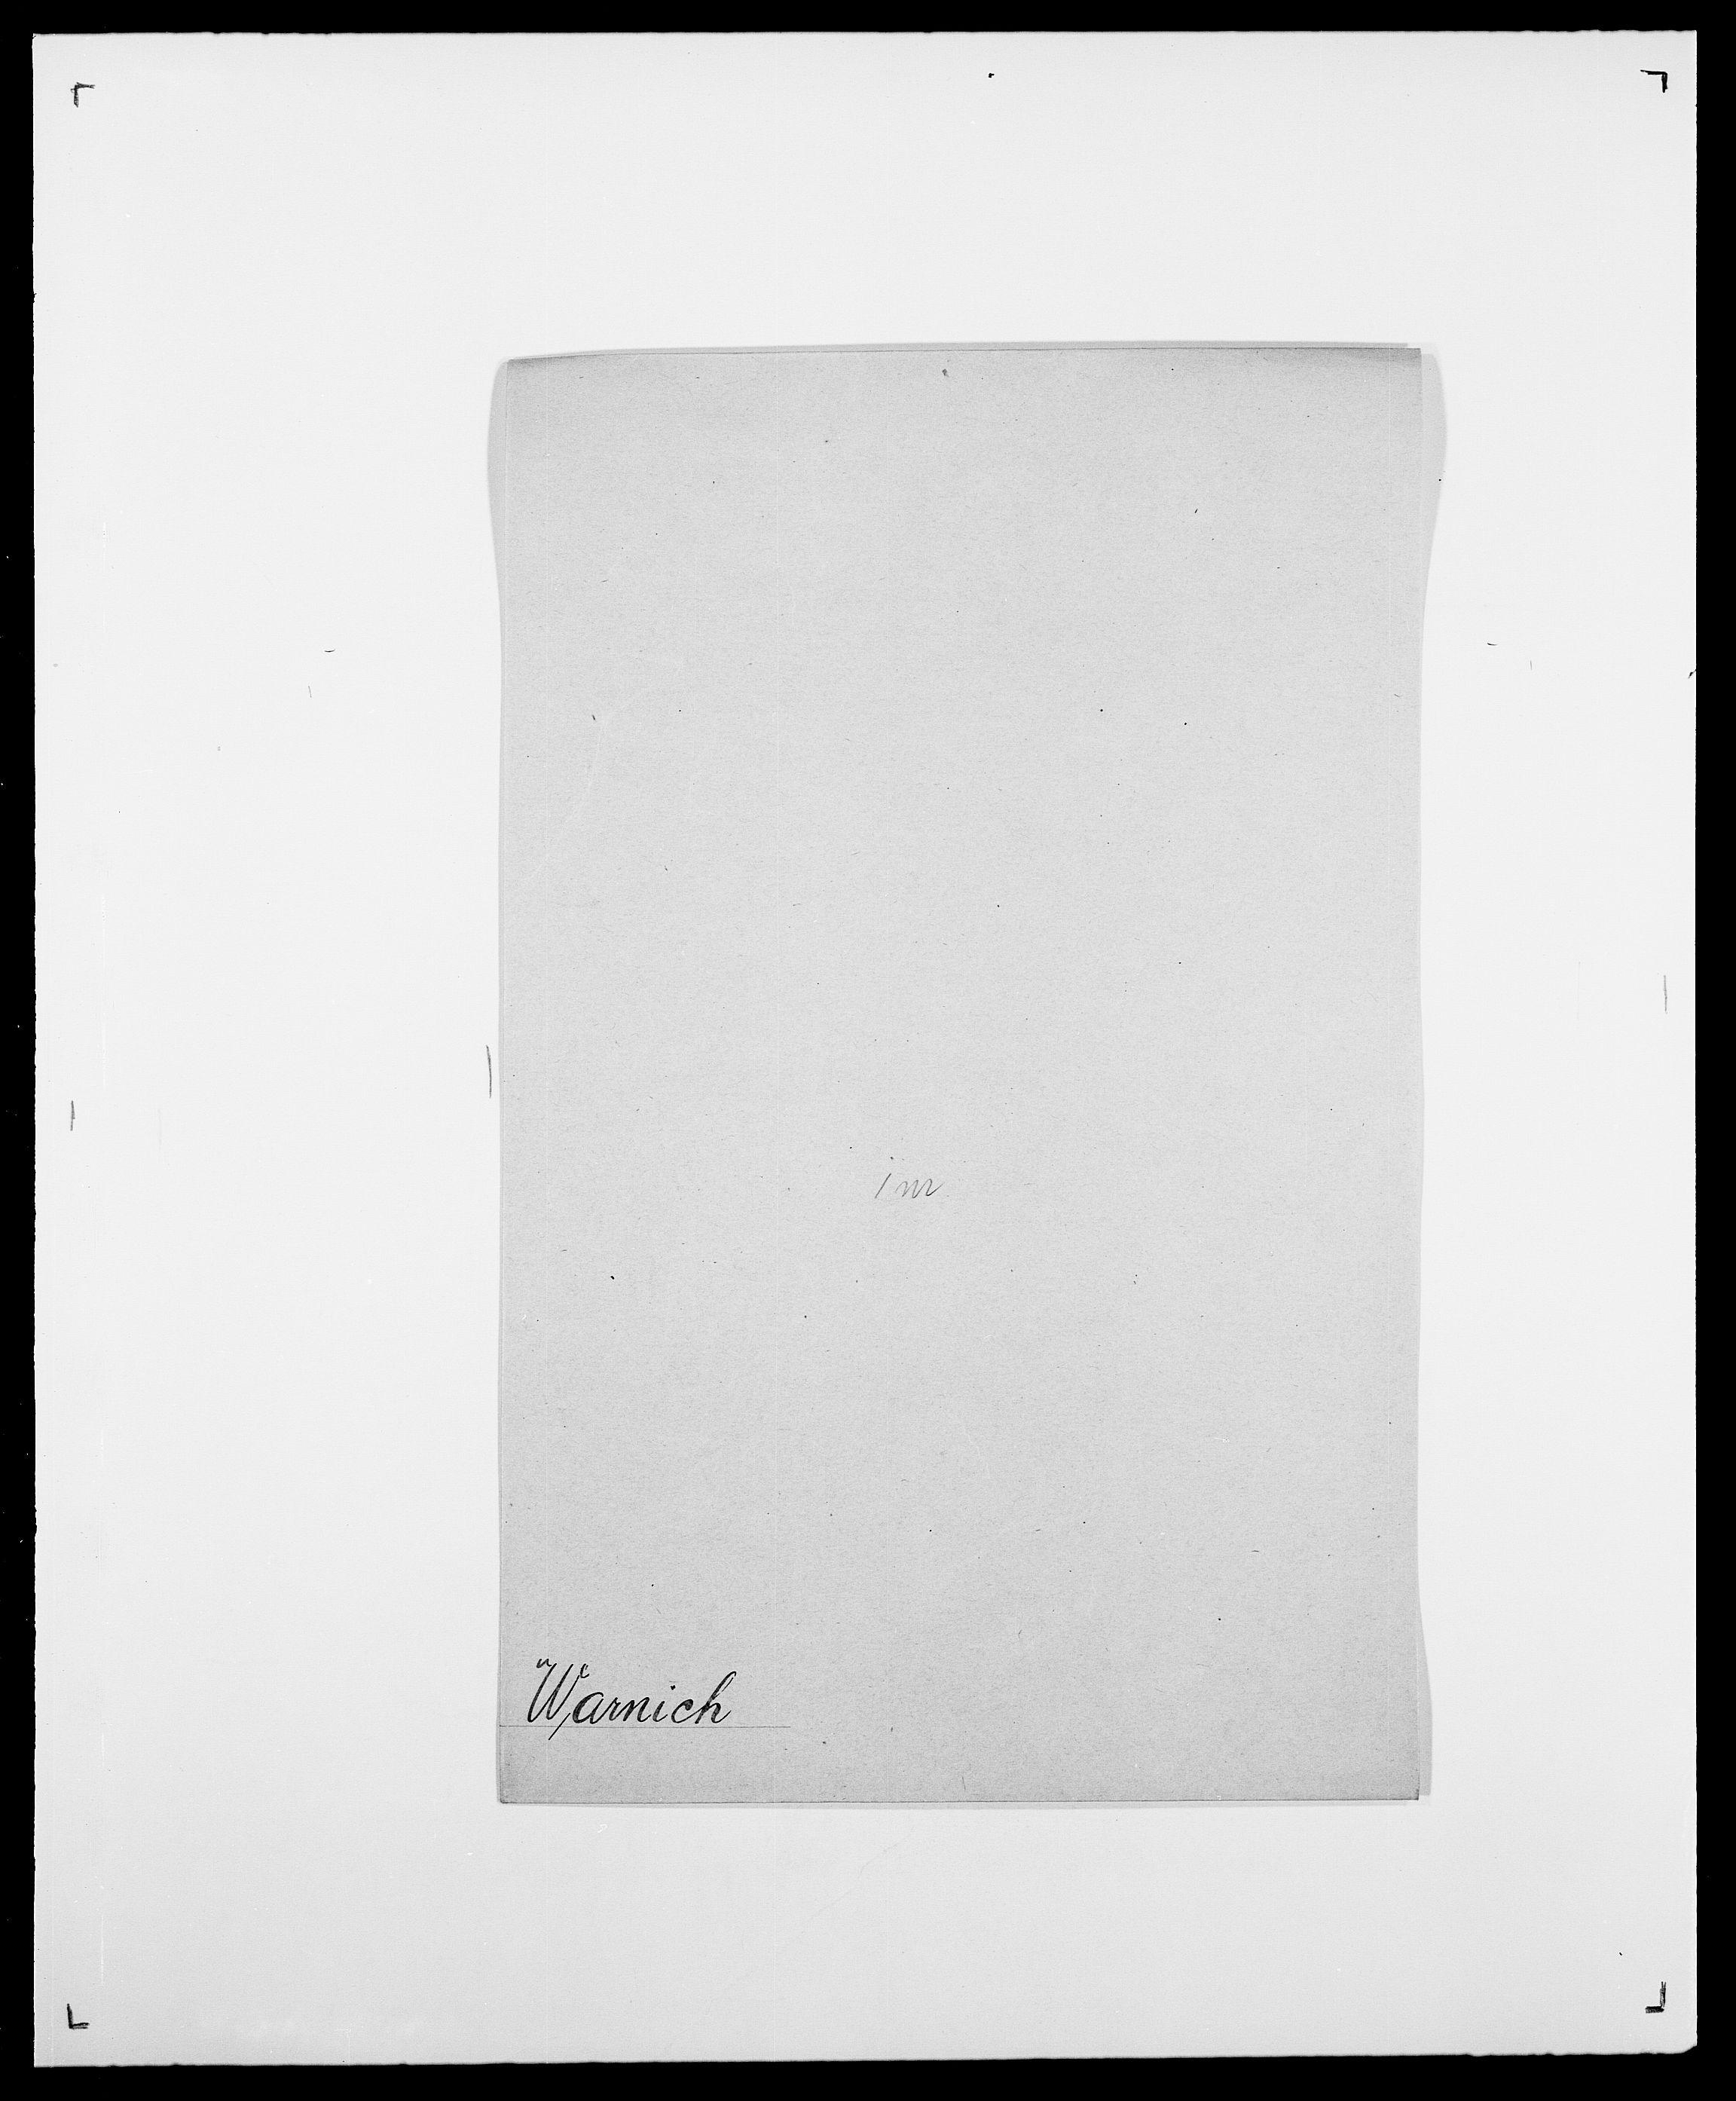 SAO, Delgobe, Charles Antoine - samling, D/Da/L0040: Usgaard - Velund, s. 335